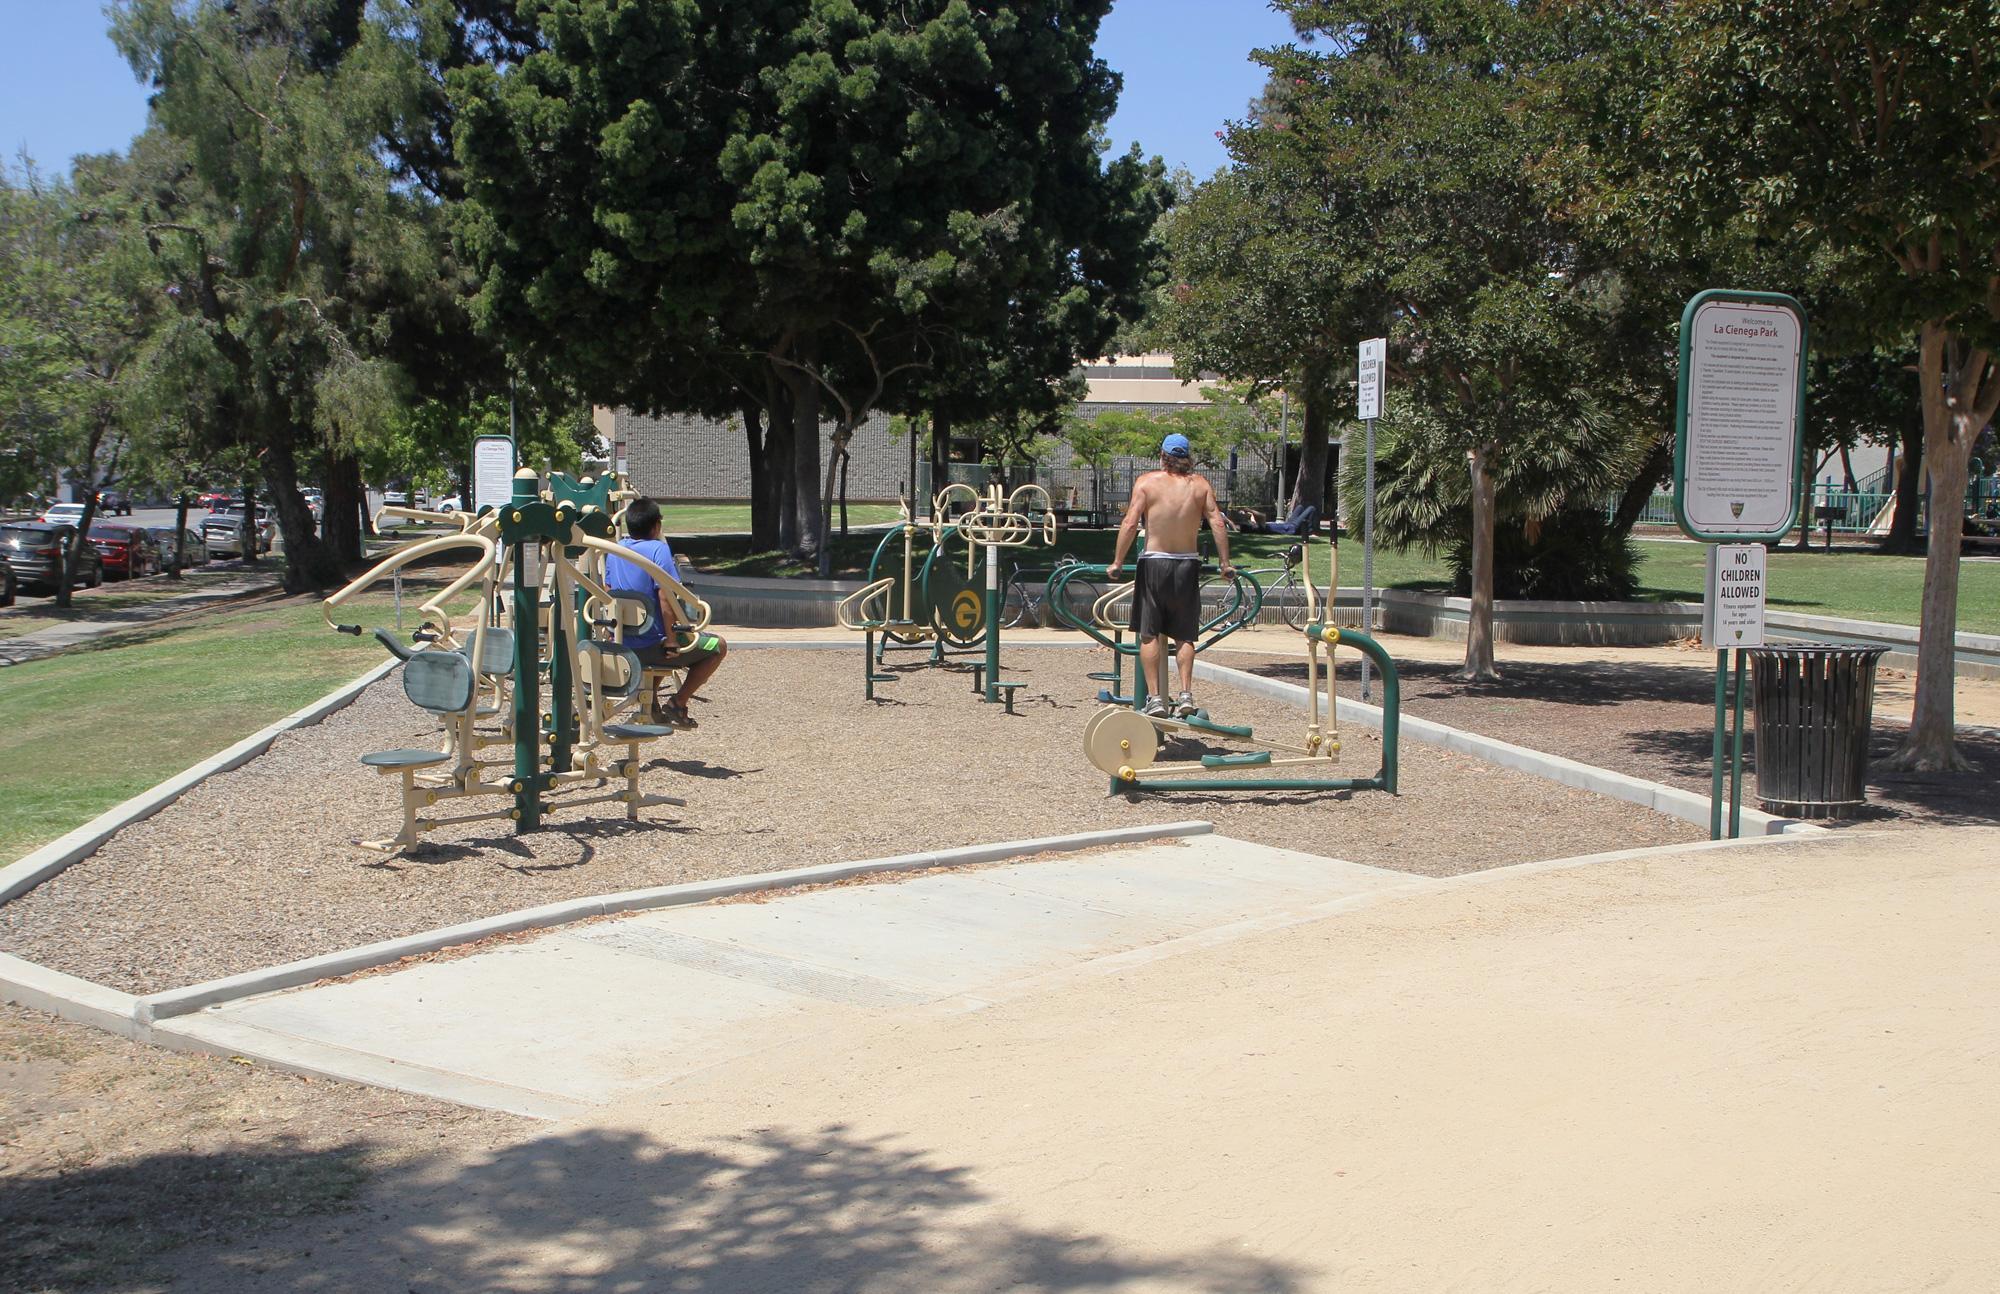 La Cienega Park Project Survey Scrap Printed Circuit Board Recycling Equipmentjpg Exercise Equipment